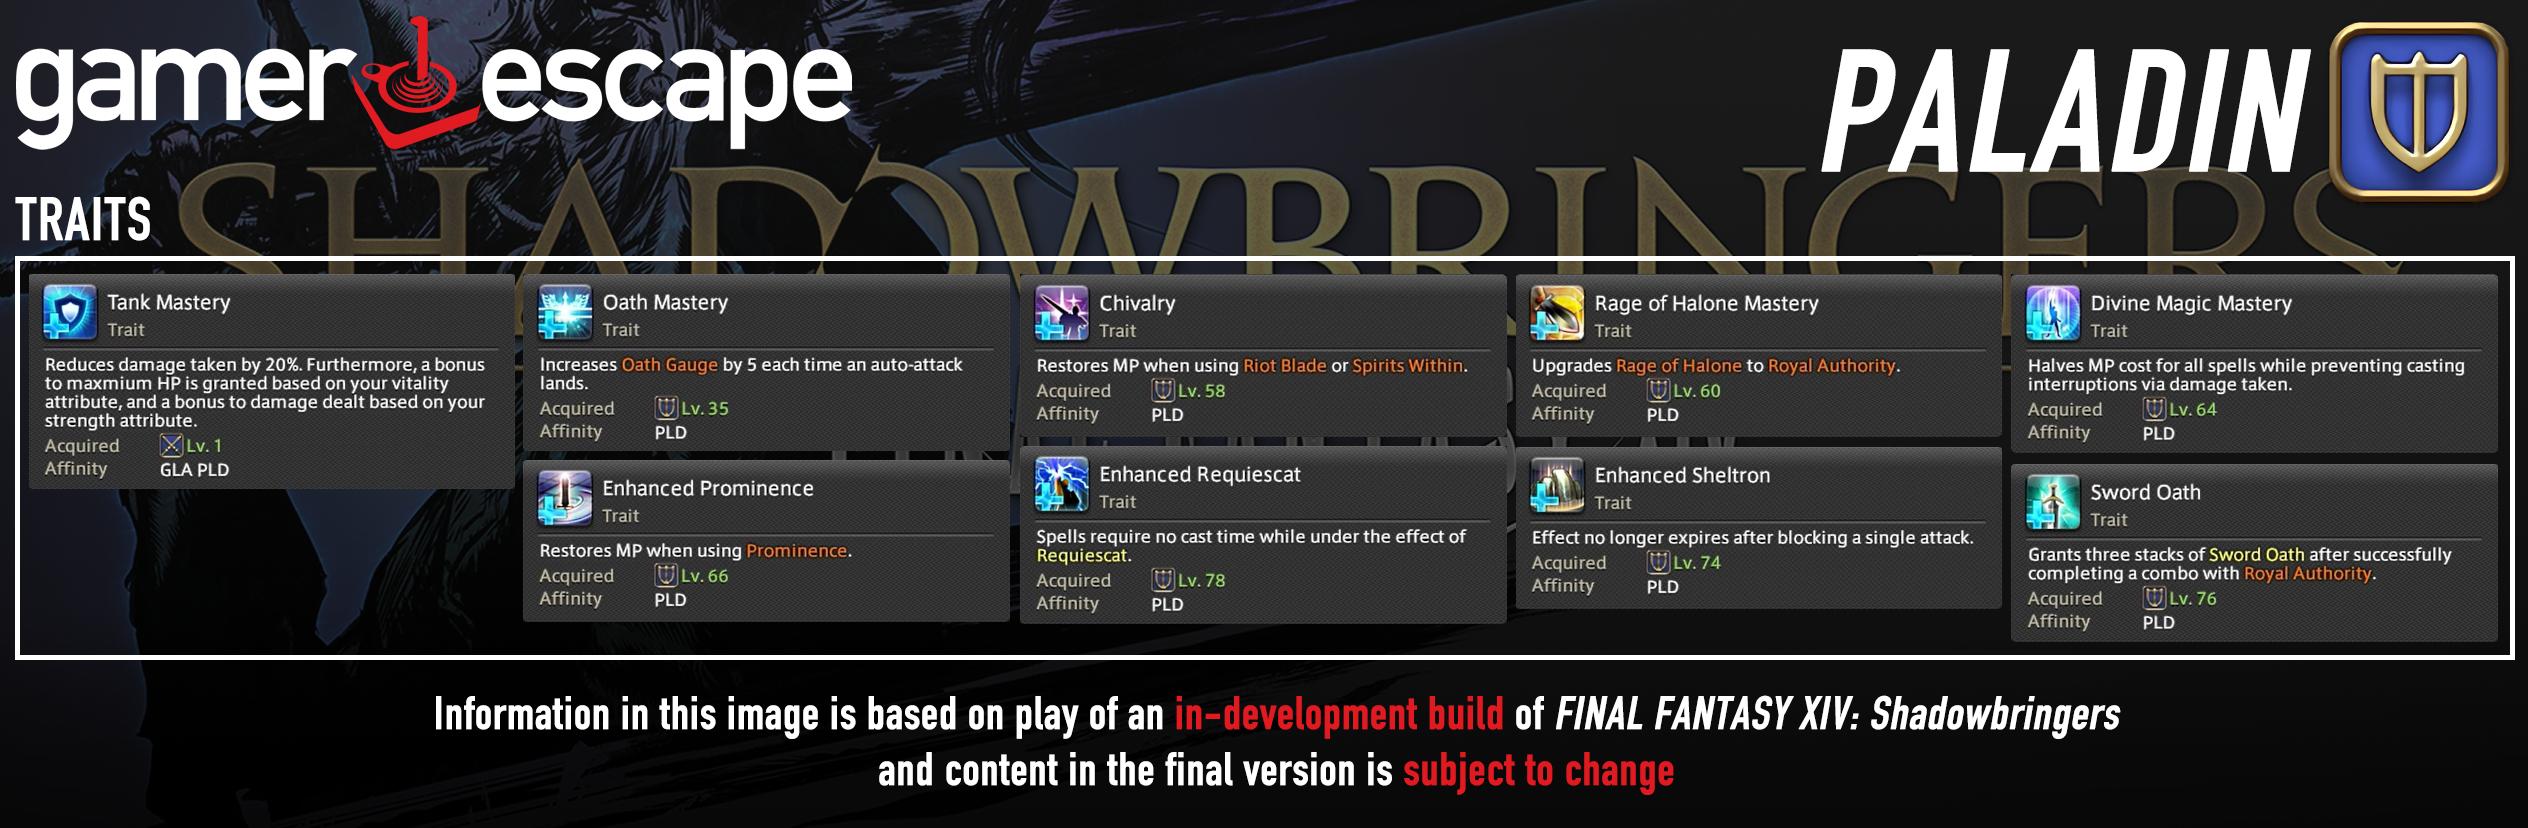 Final Fantasy XIV: Shadowbringers Hands-On with Paladin – Gamer